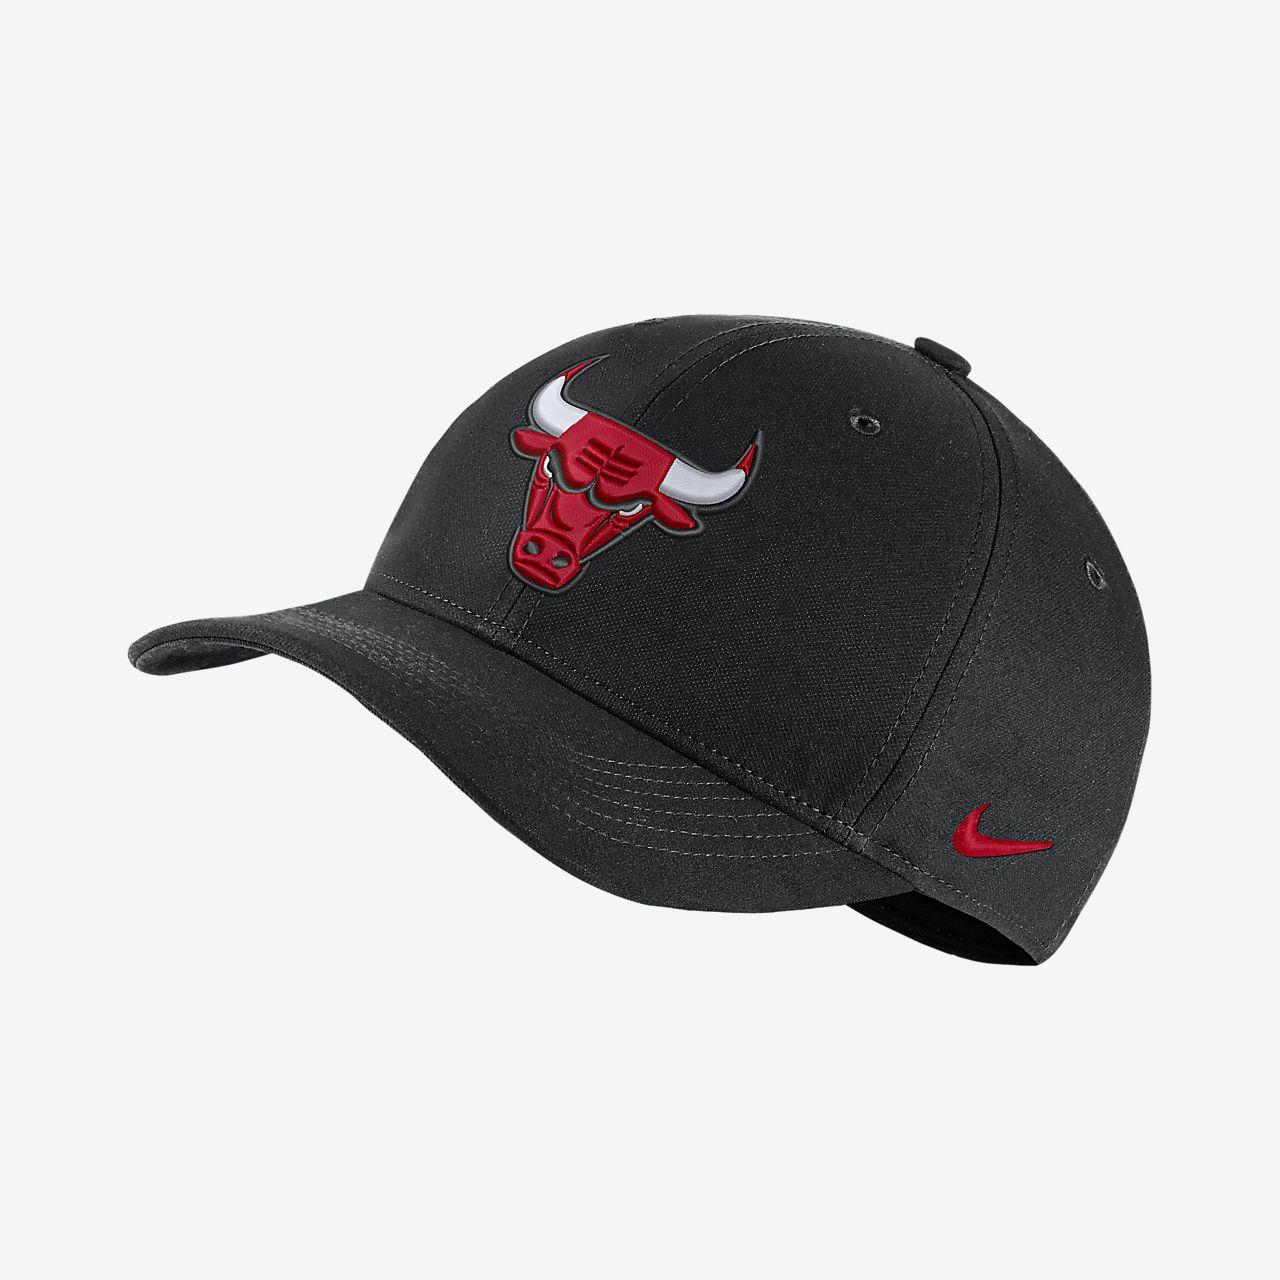 d902c8594422 Casquette NBA Chicago Bulls City Edition Nike AeroBill Classic99 ...